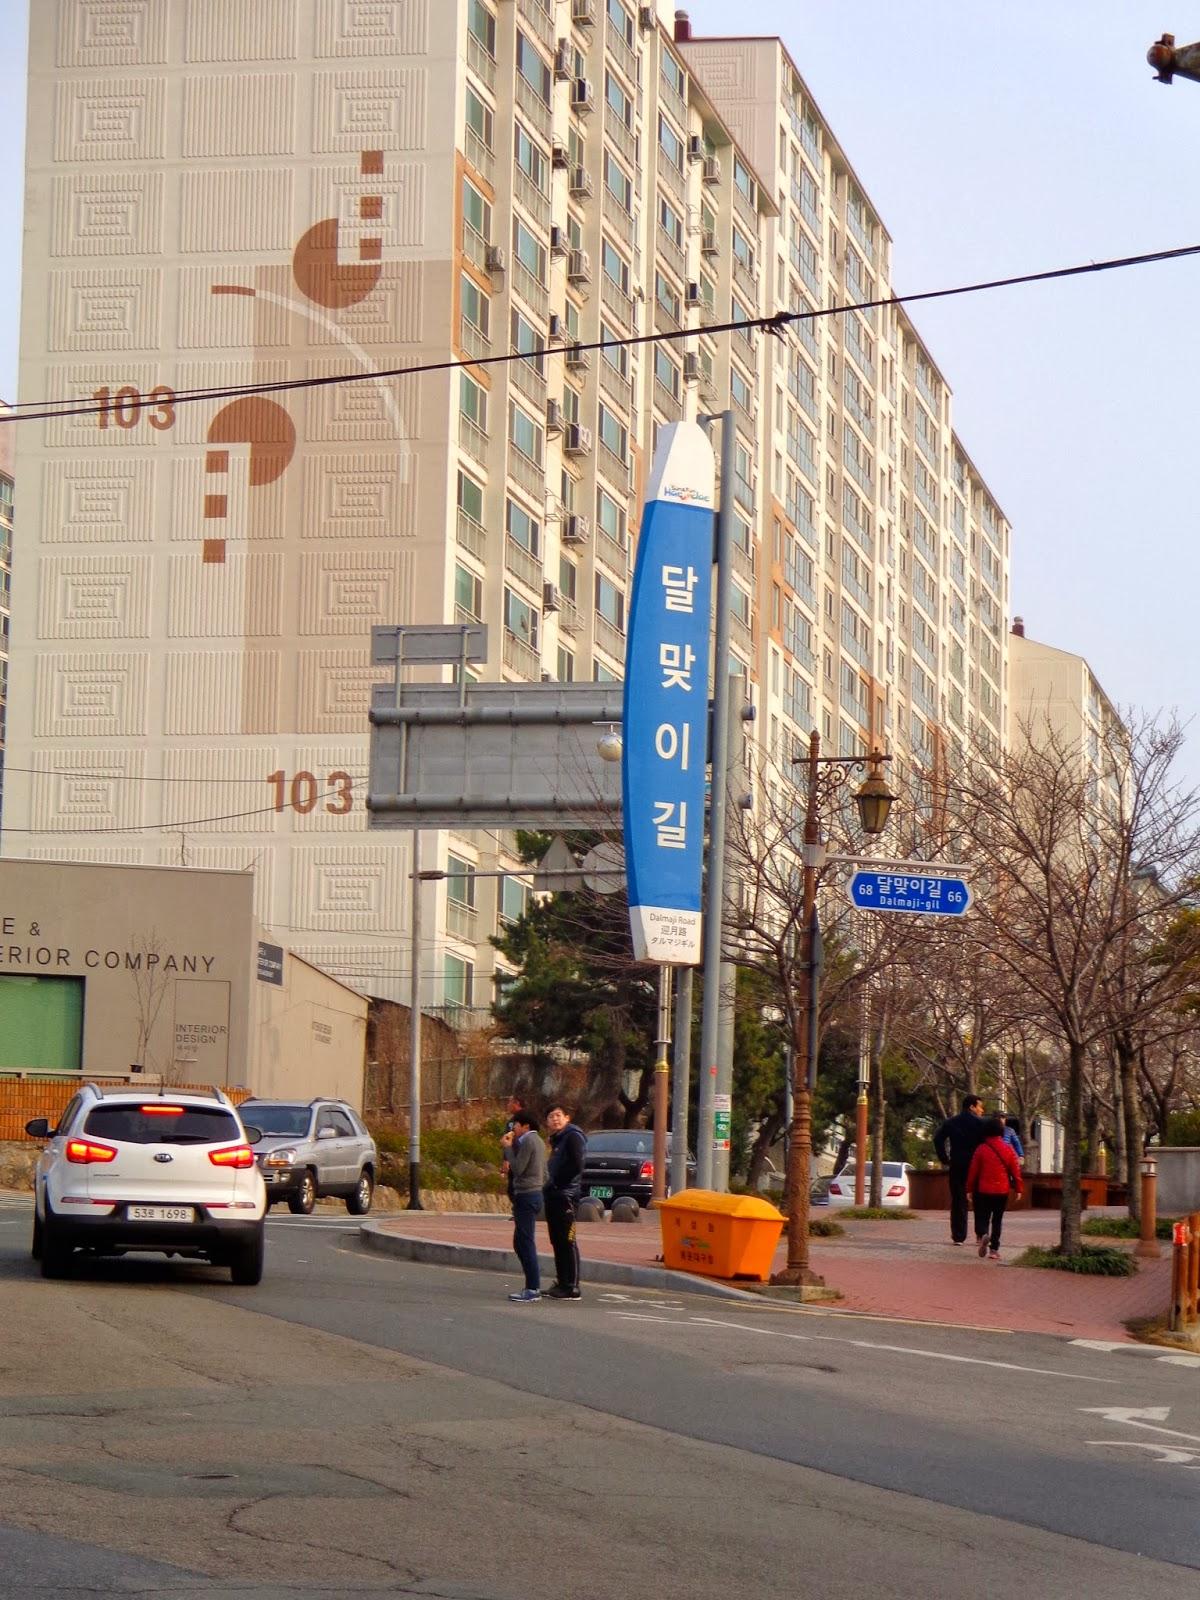 Dalmaji Road, Busan Korea